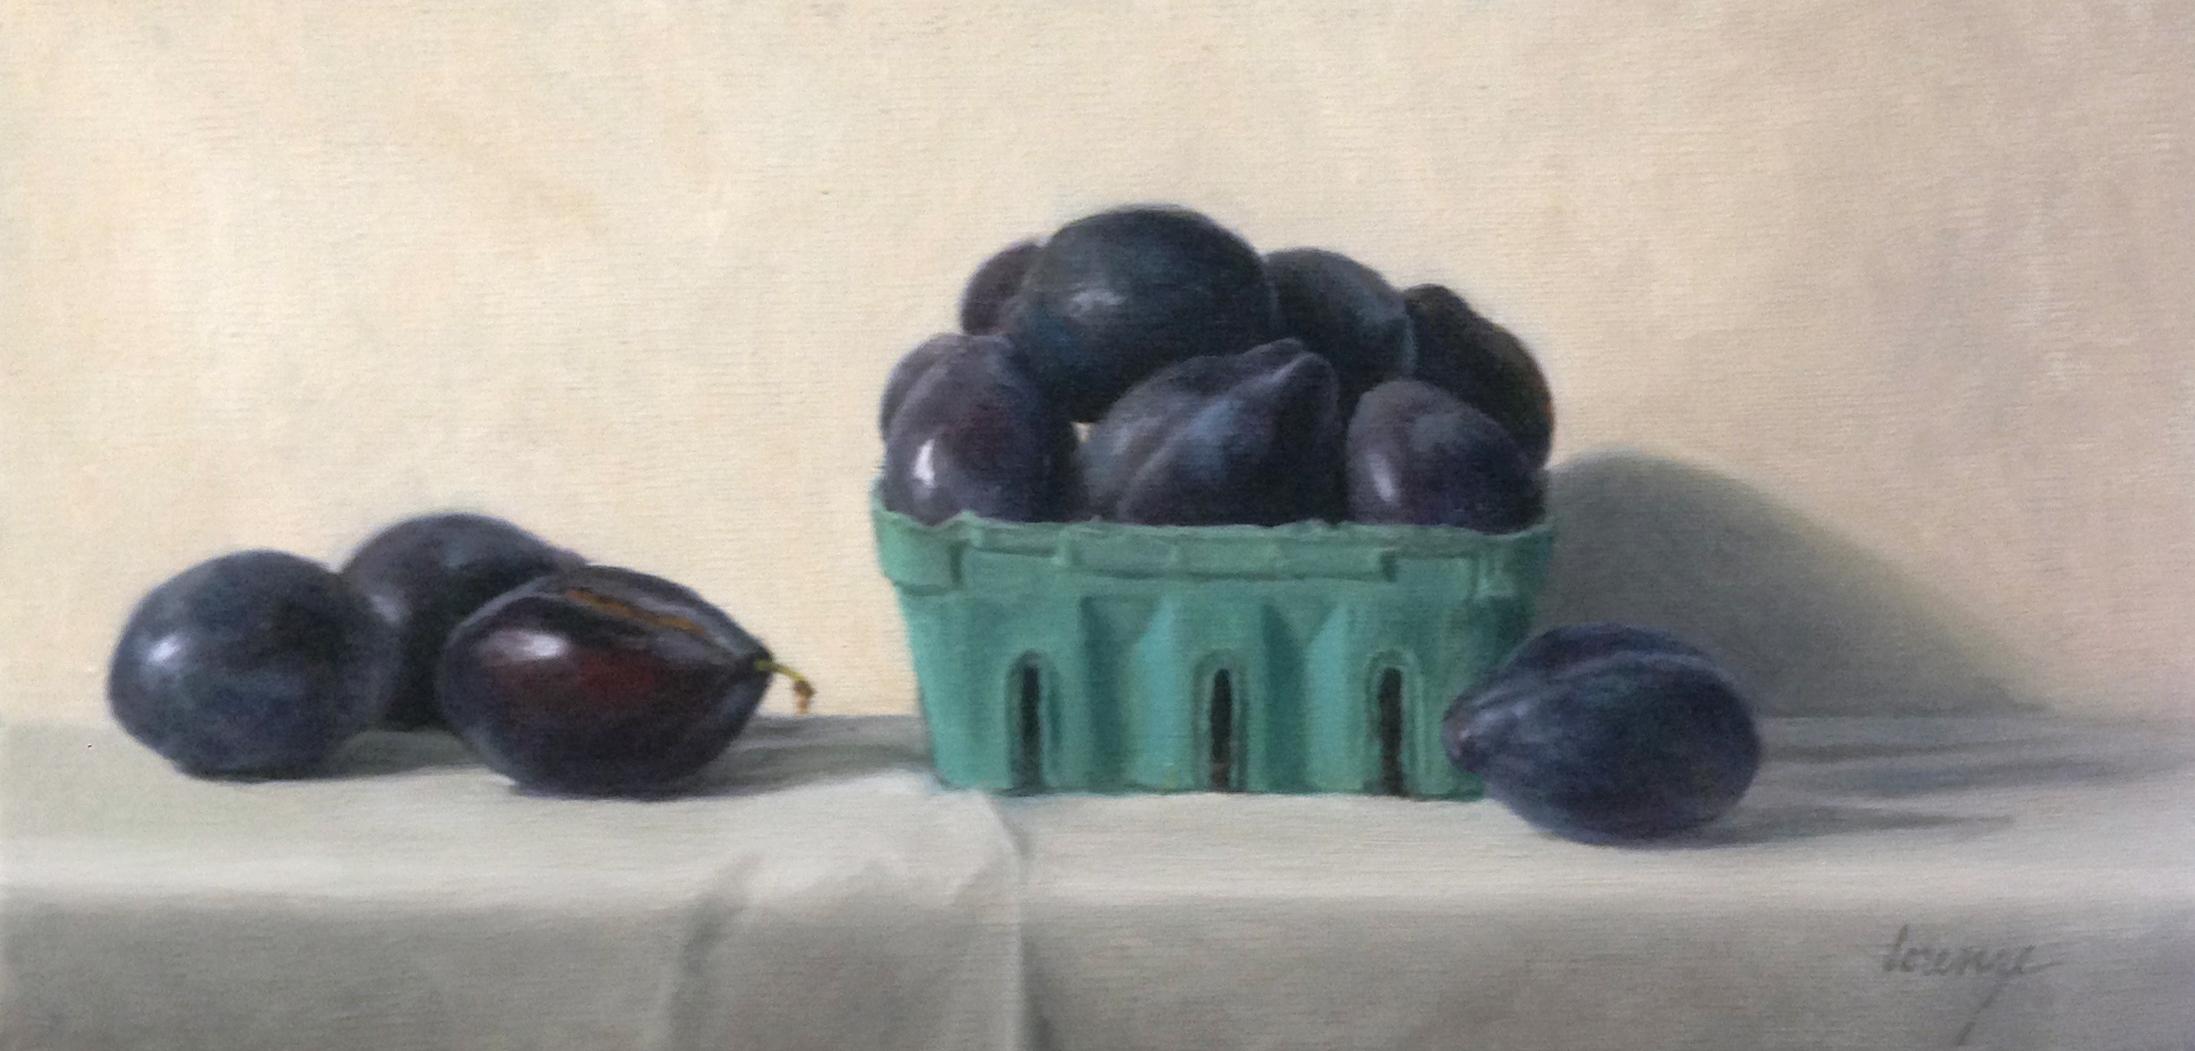 plums in berrybasket